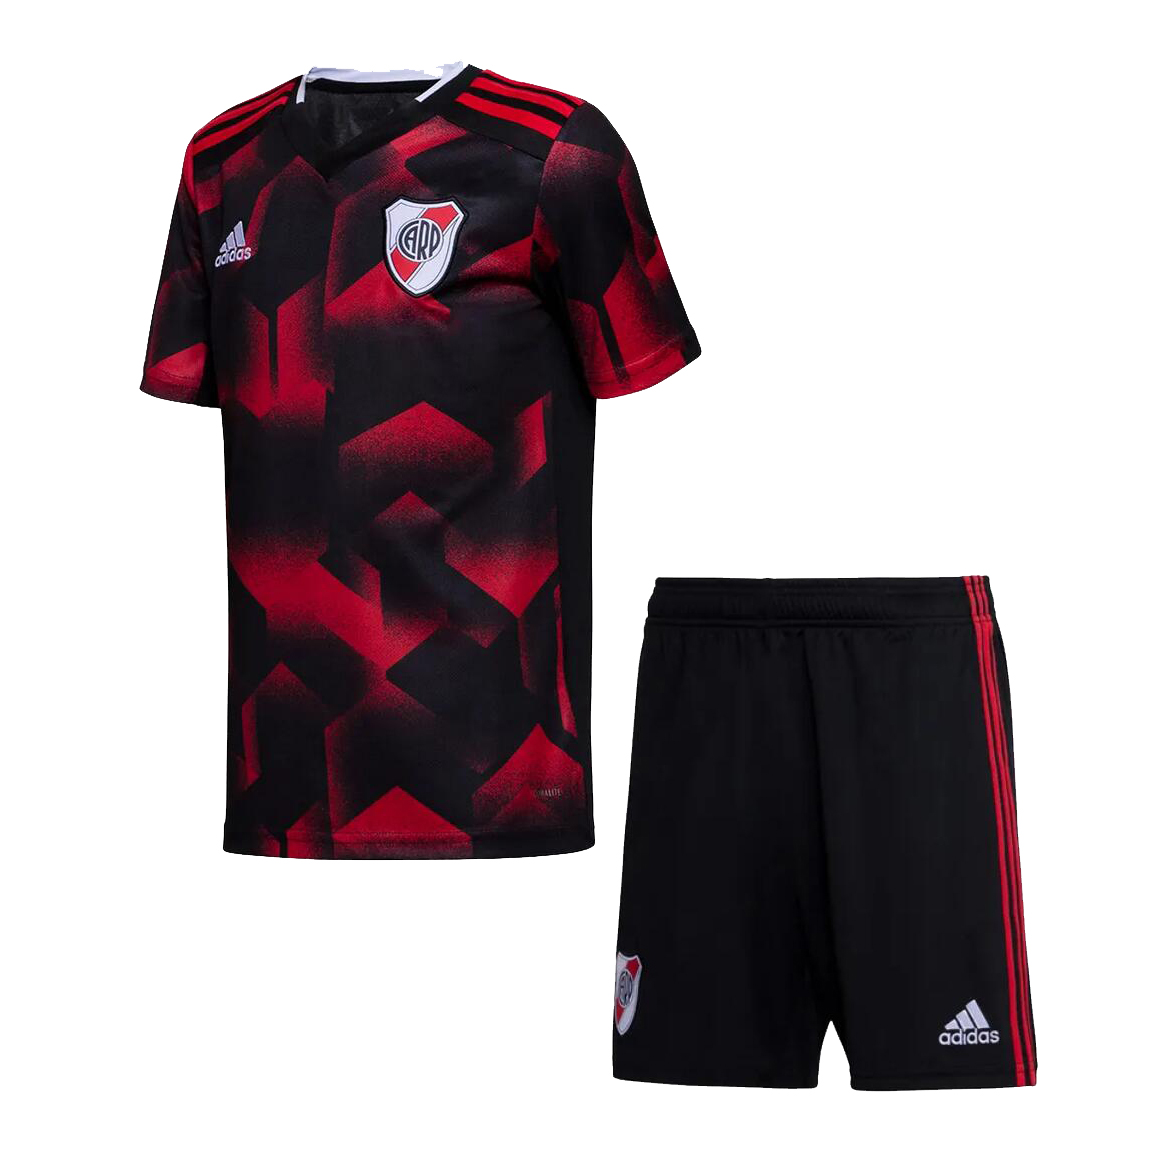 eaad2656e34 US$ 14.8 - River Plate Away Jersey Kids' 2019/20 - www.fcsoccerworld.com